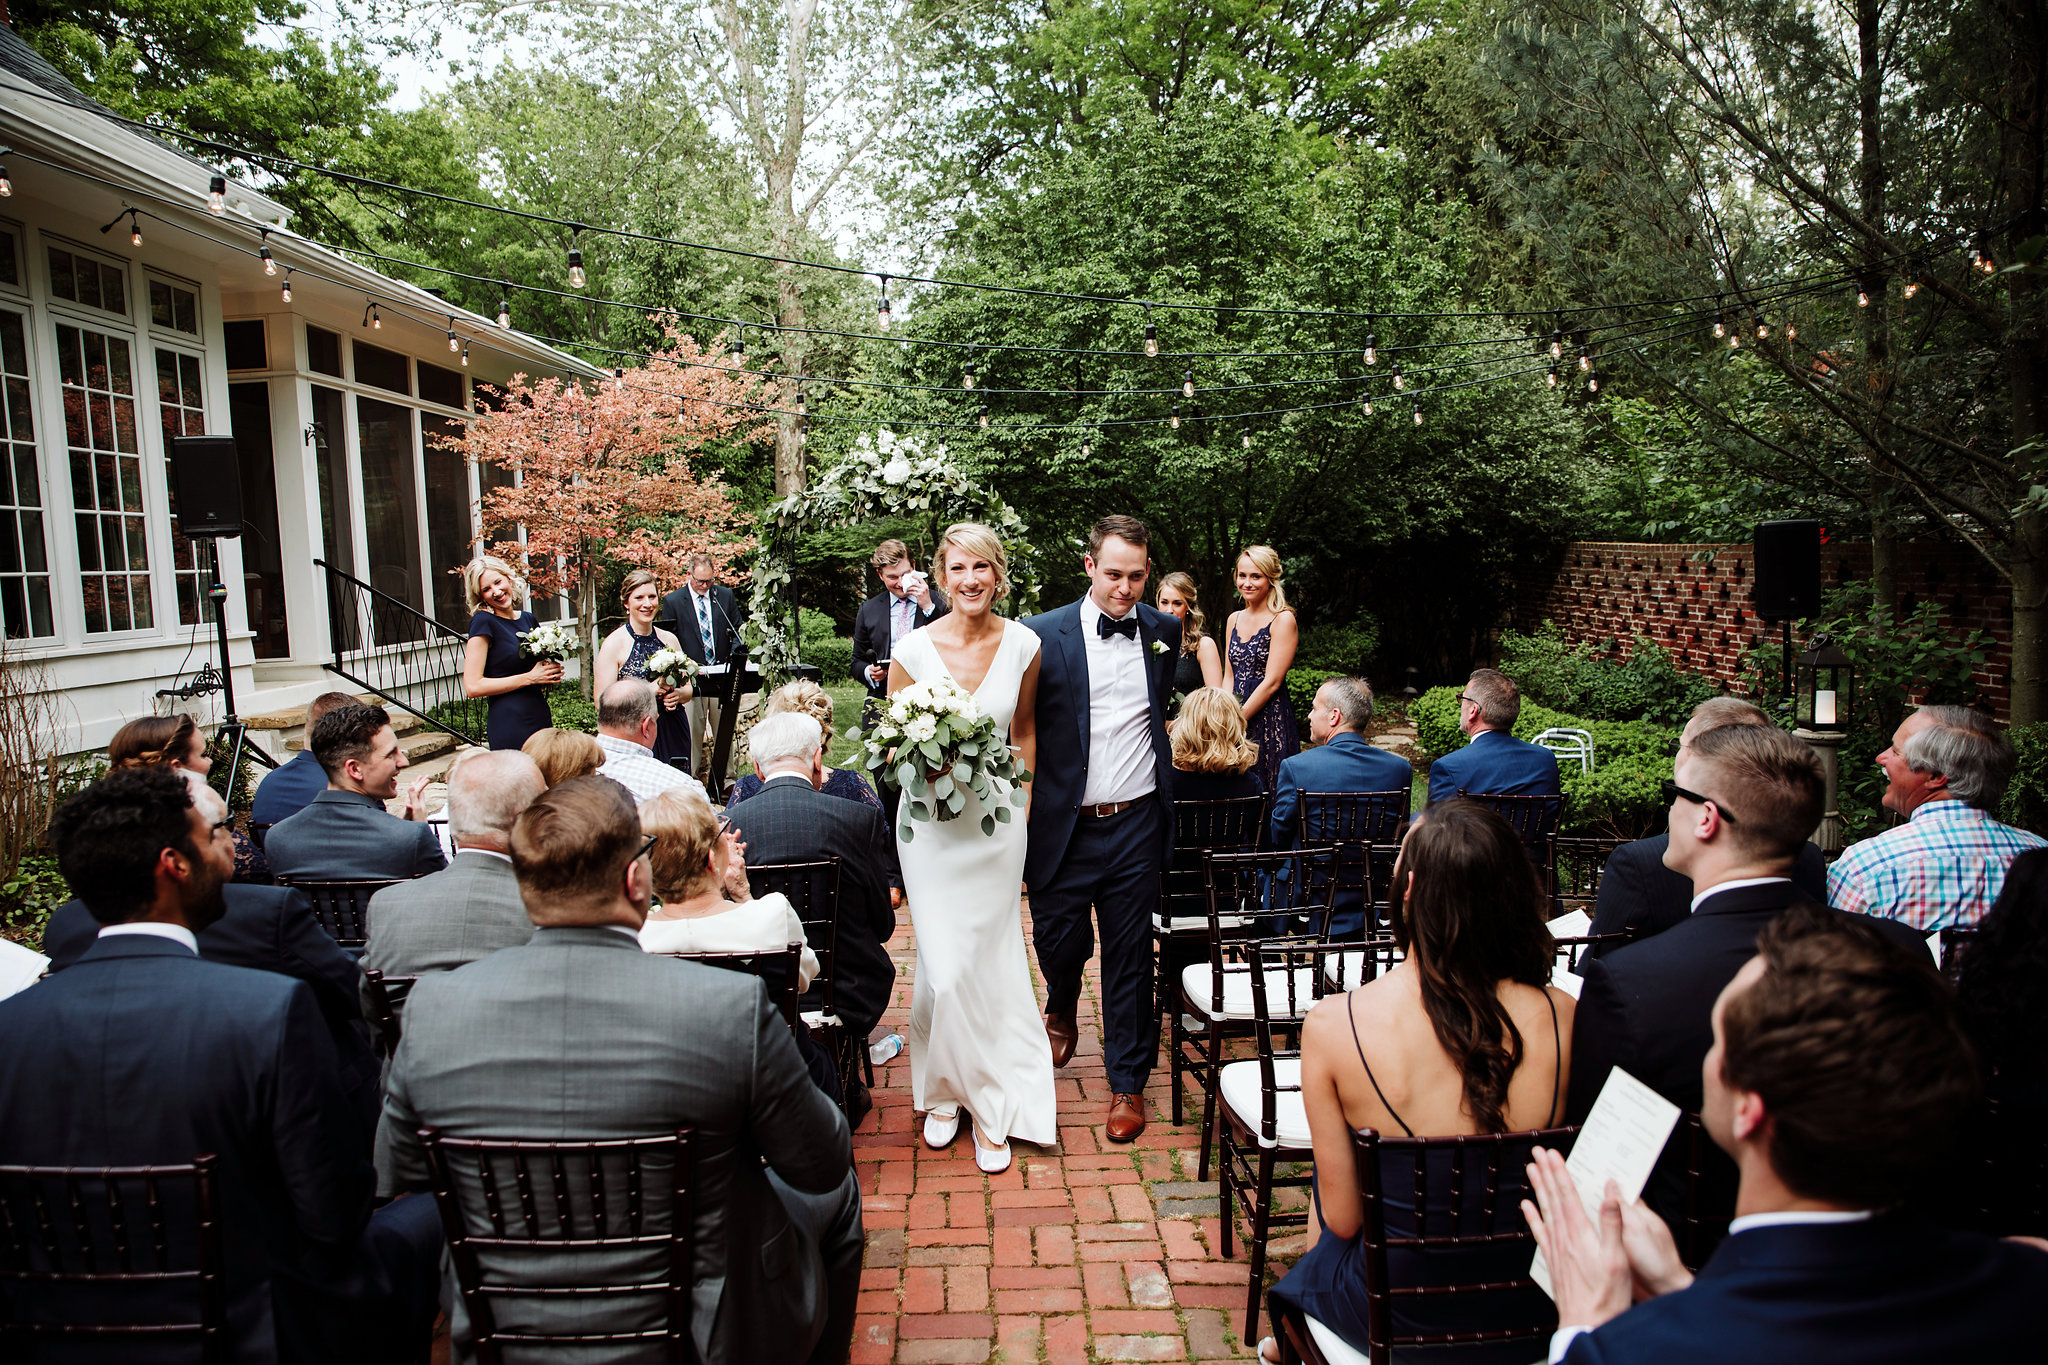 Boulevard Brewer and Brookside Backyard Spring Wedding_Kindling Wedding Photography_09.JPG